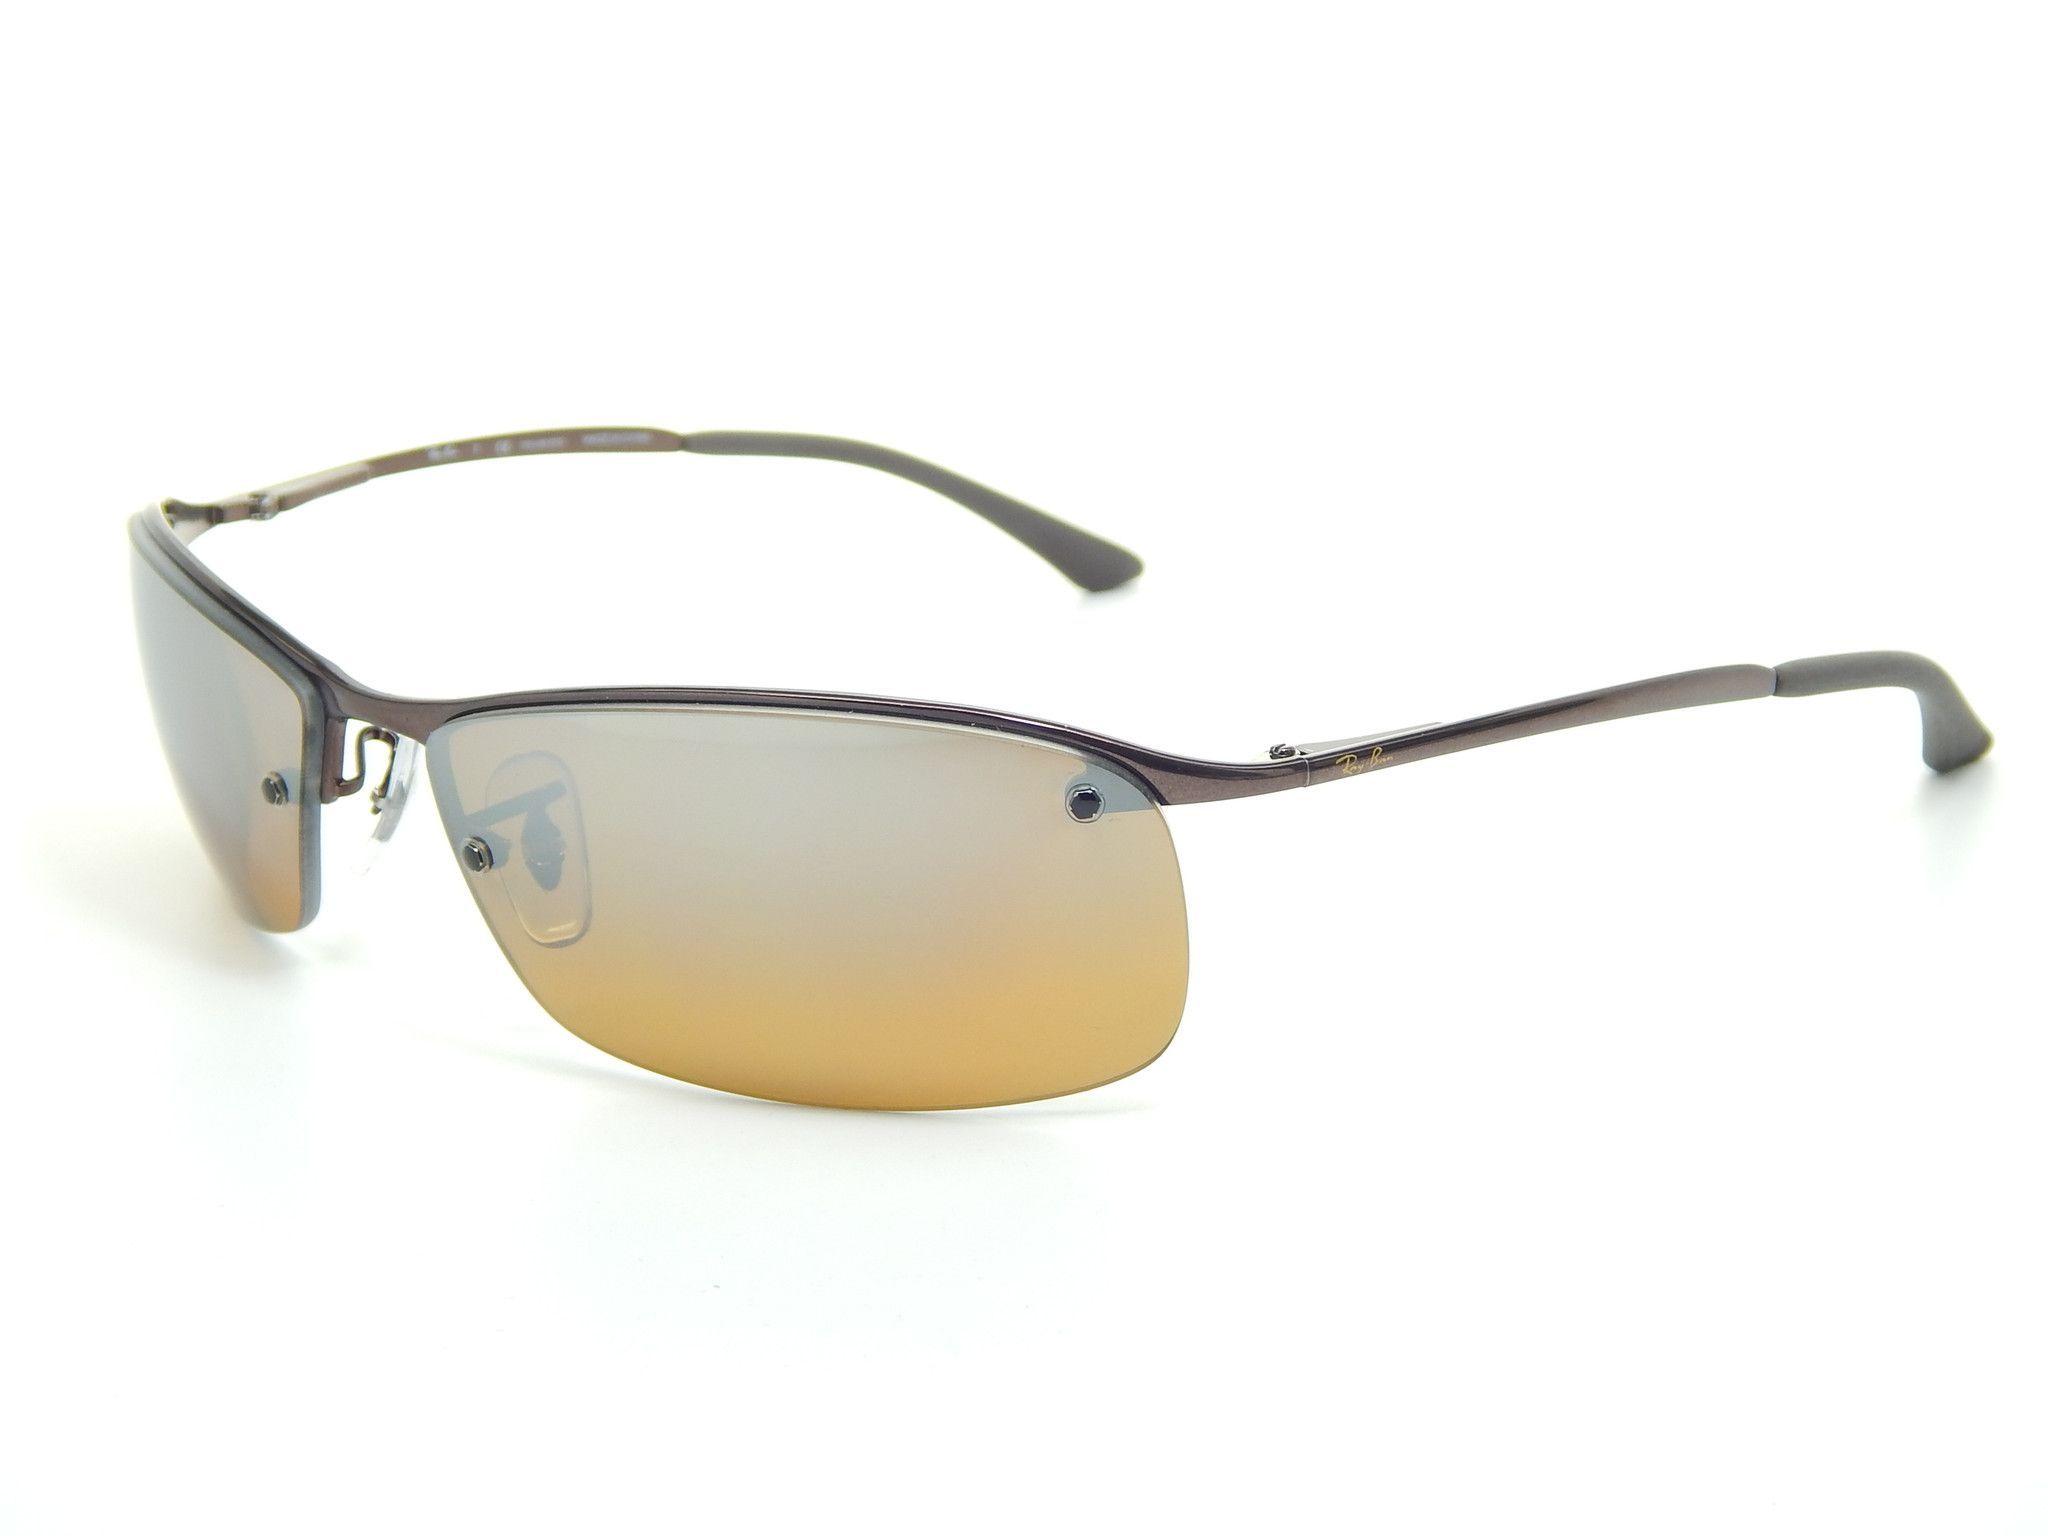 62fbf8b3fbd1d3 Ray Ban RB3183 014 84 Brown  Brown Gradient 63mm Polarized Sunglasses